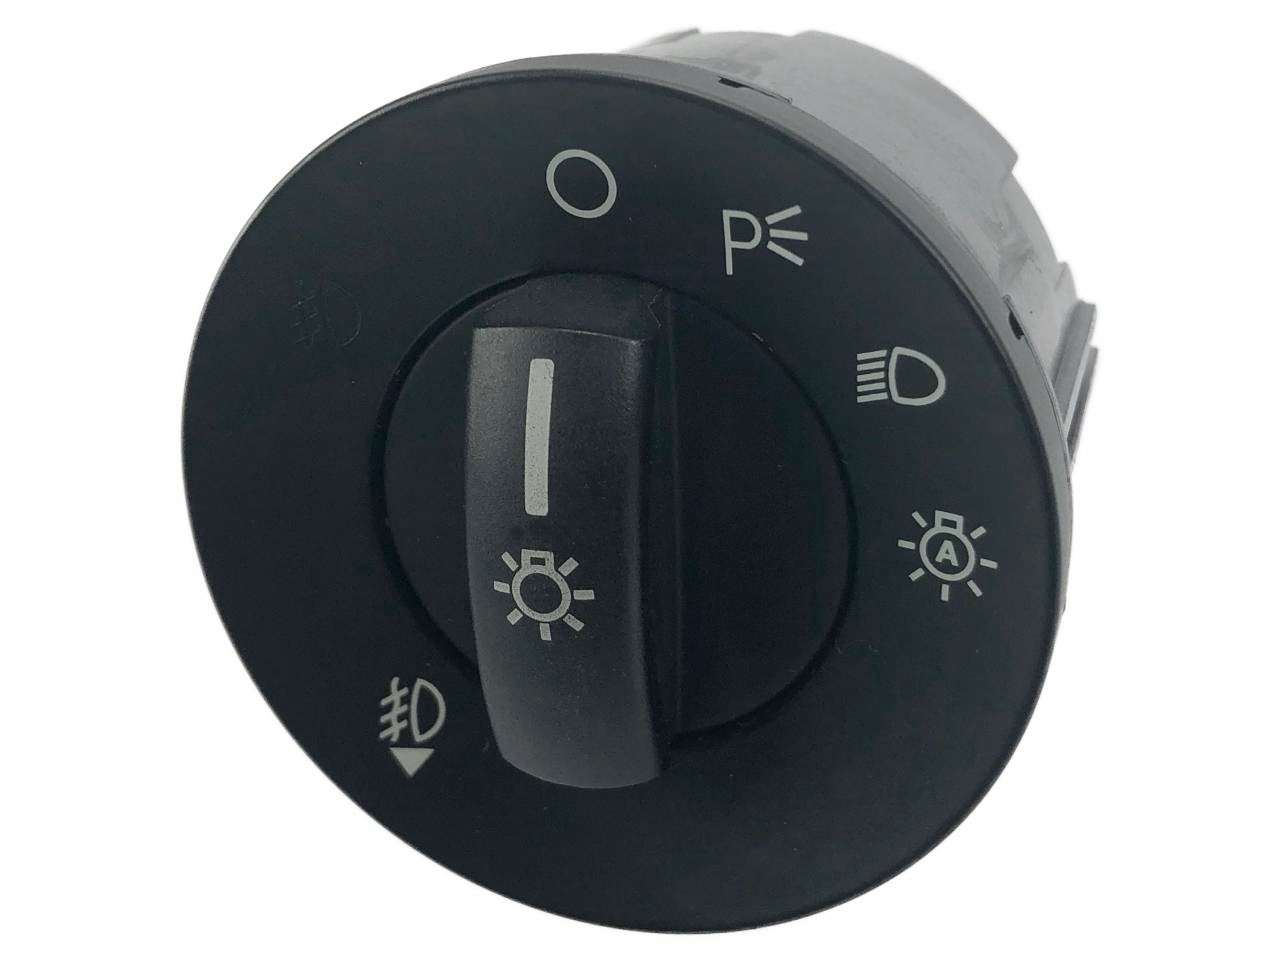 Botão Interruptor de Lanterna Farol Milha AUTO do Painel ar3t13d061cb3ja6 Ford Fusion 010 011 012